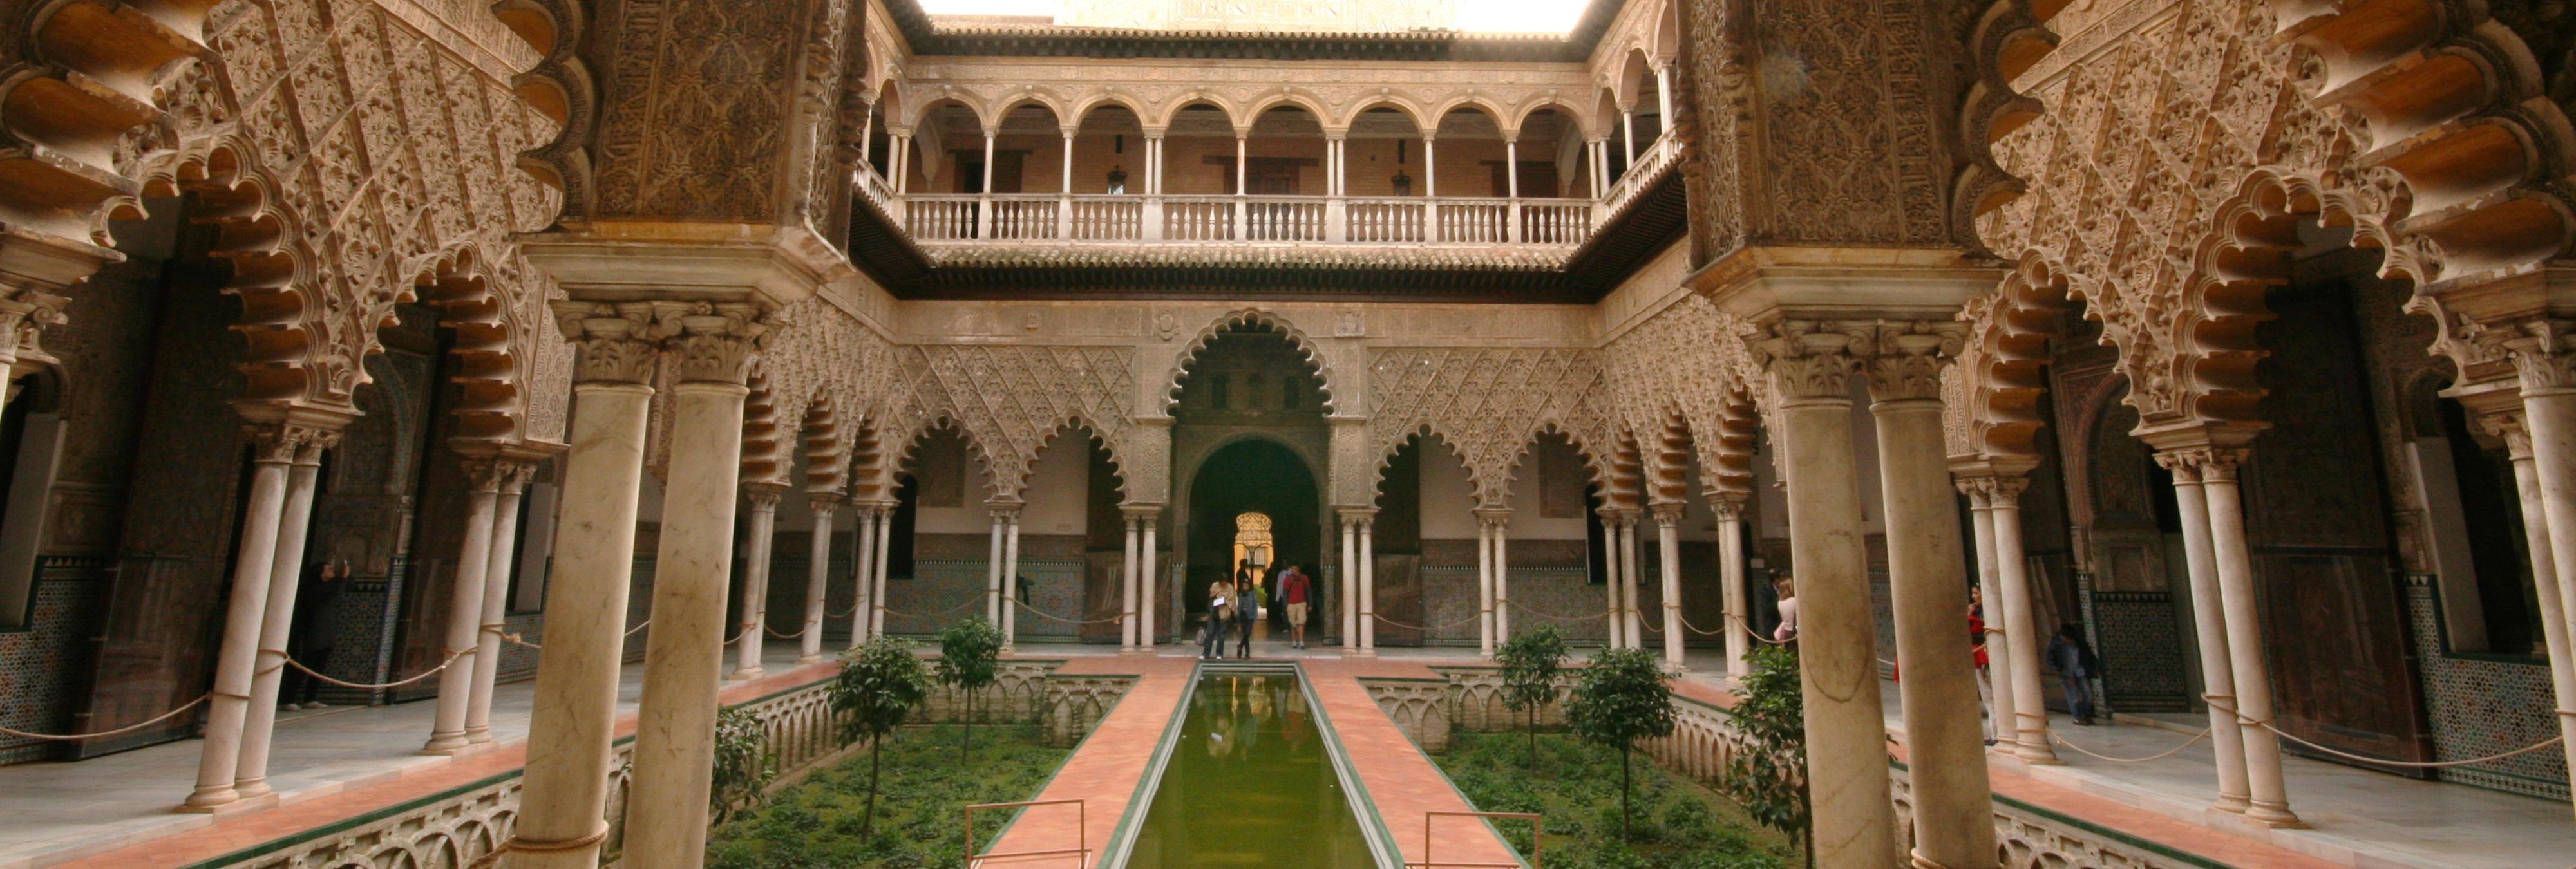 'Juego de Tronos', a la conquista de España